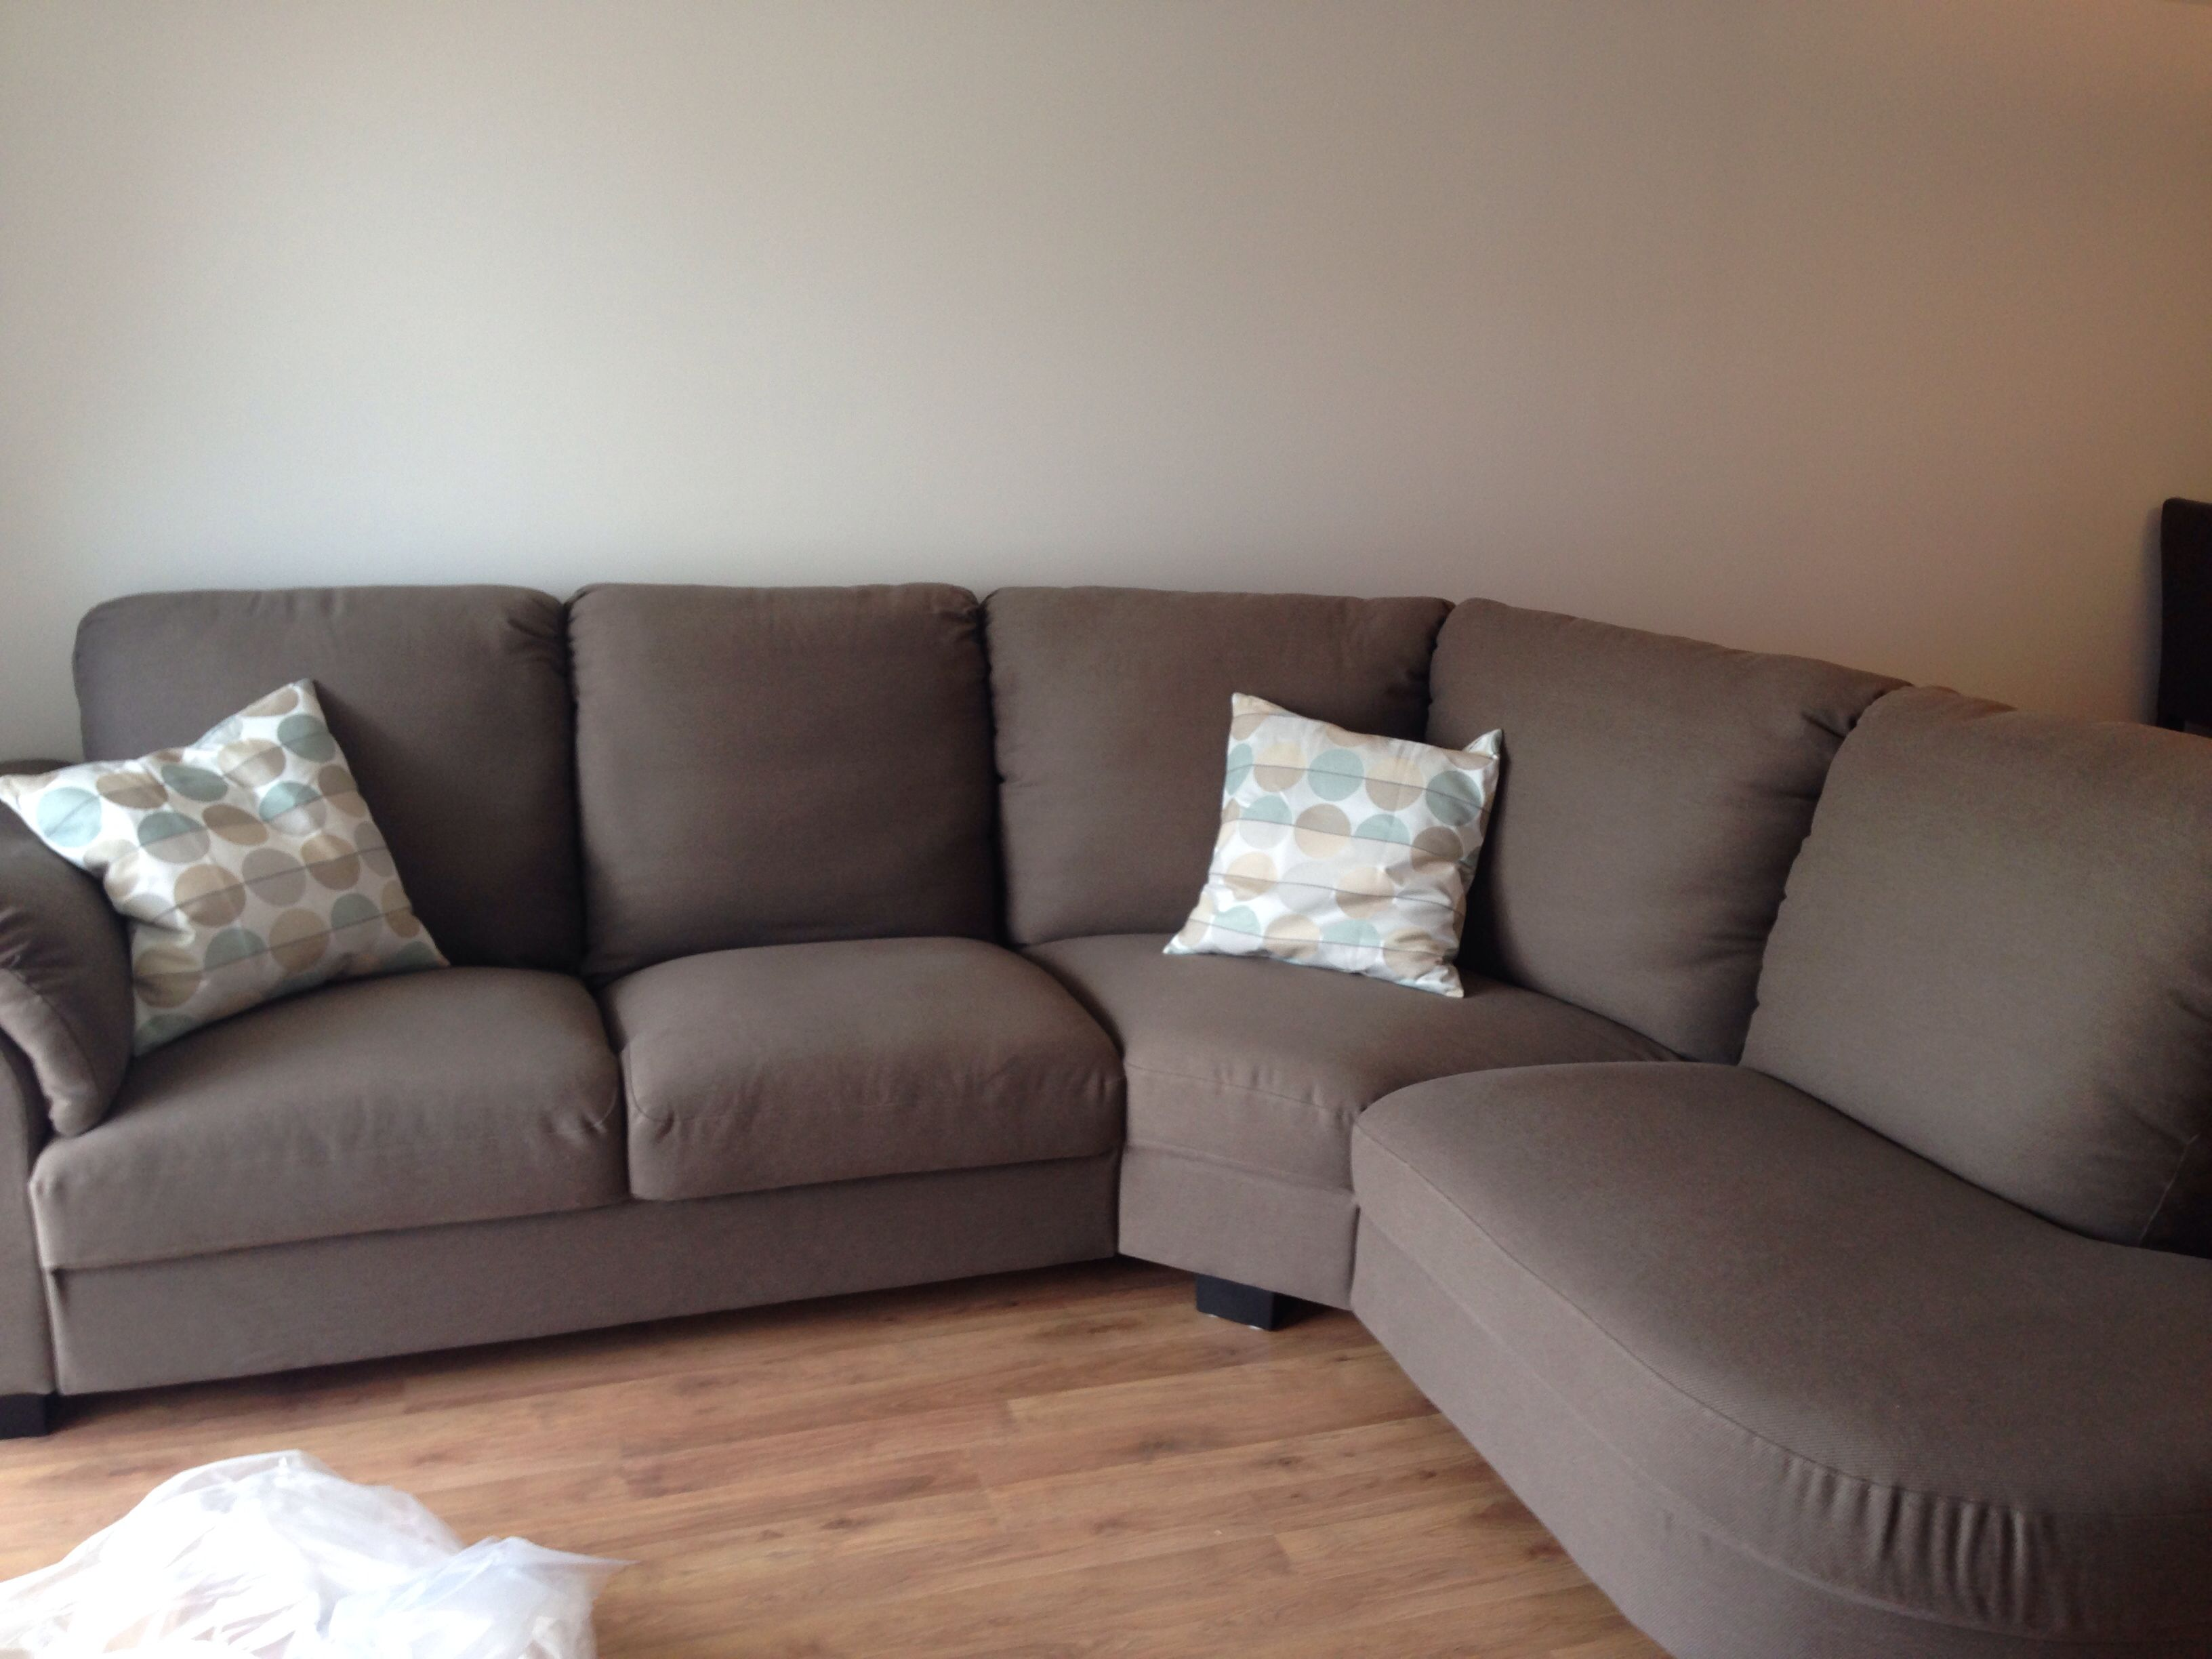 New Sofa   Ikea Tidafors